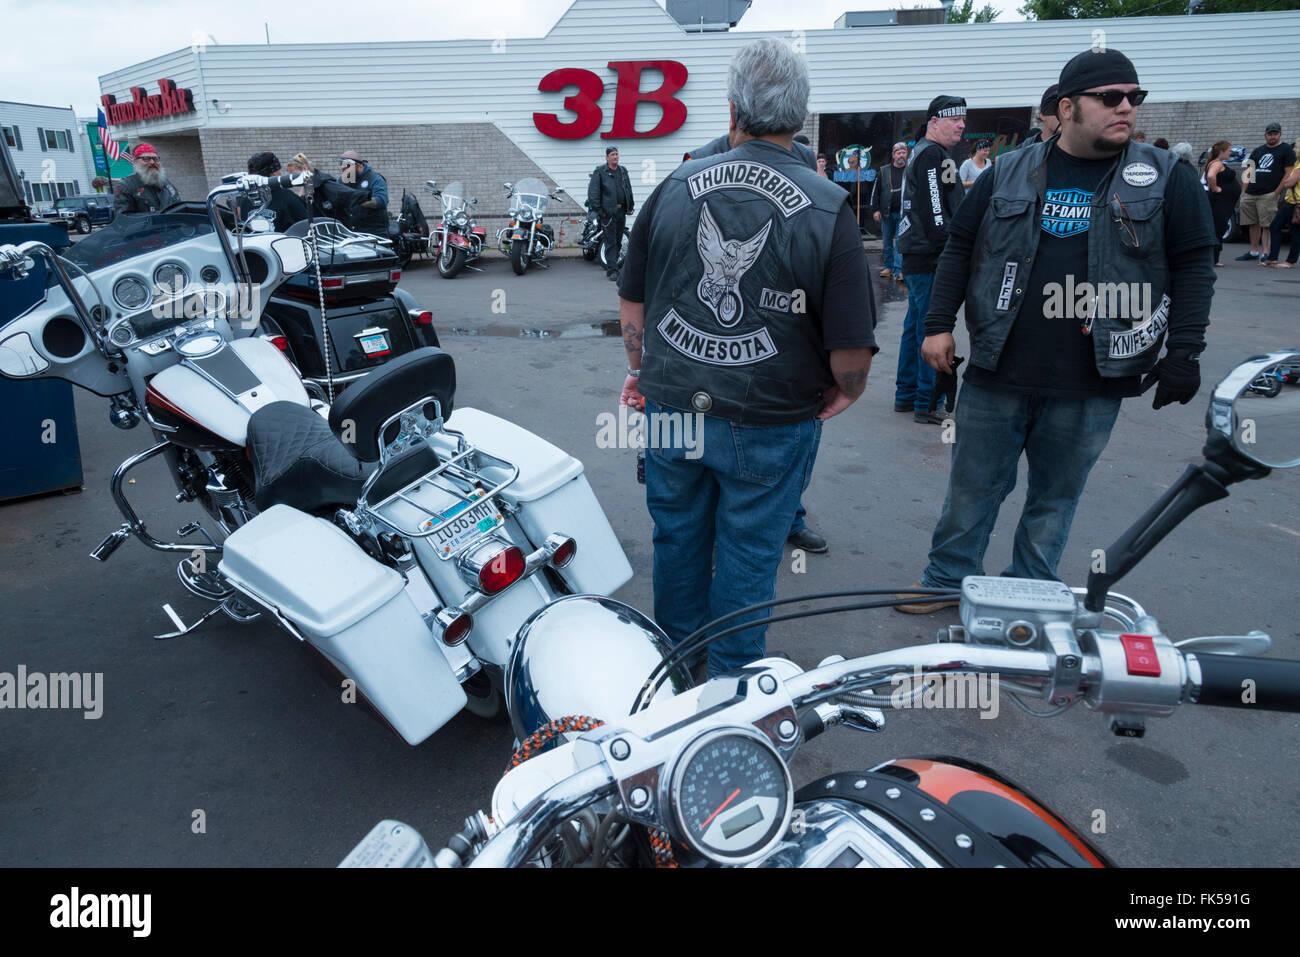 Motorbike Club Stock Photos & Motorbike Club Stock Images